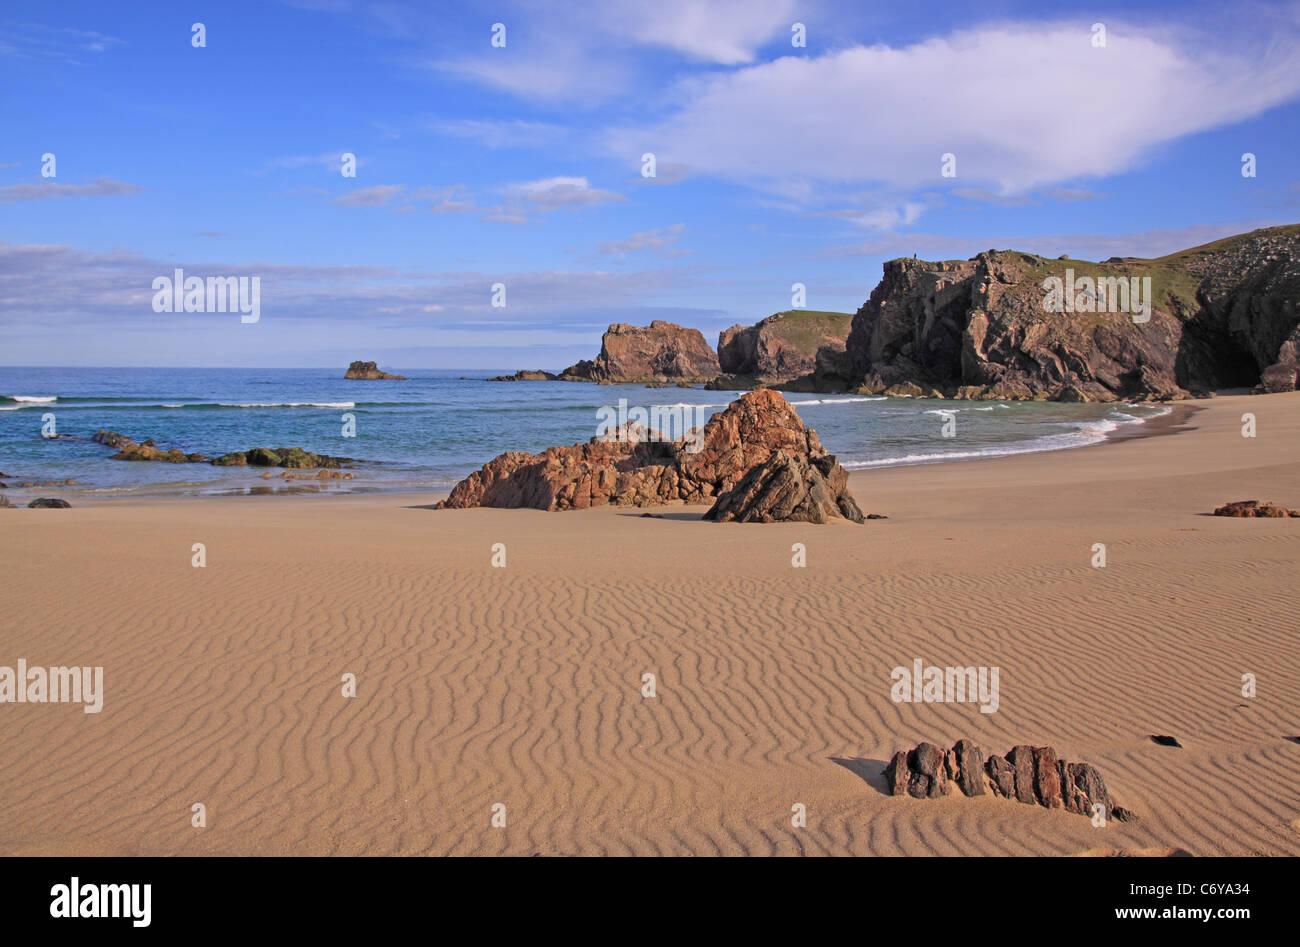 UK Scotland Outer Hebrides Isle of Lewis Mangersta Beach - Stock Image